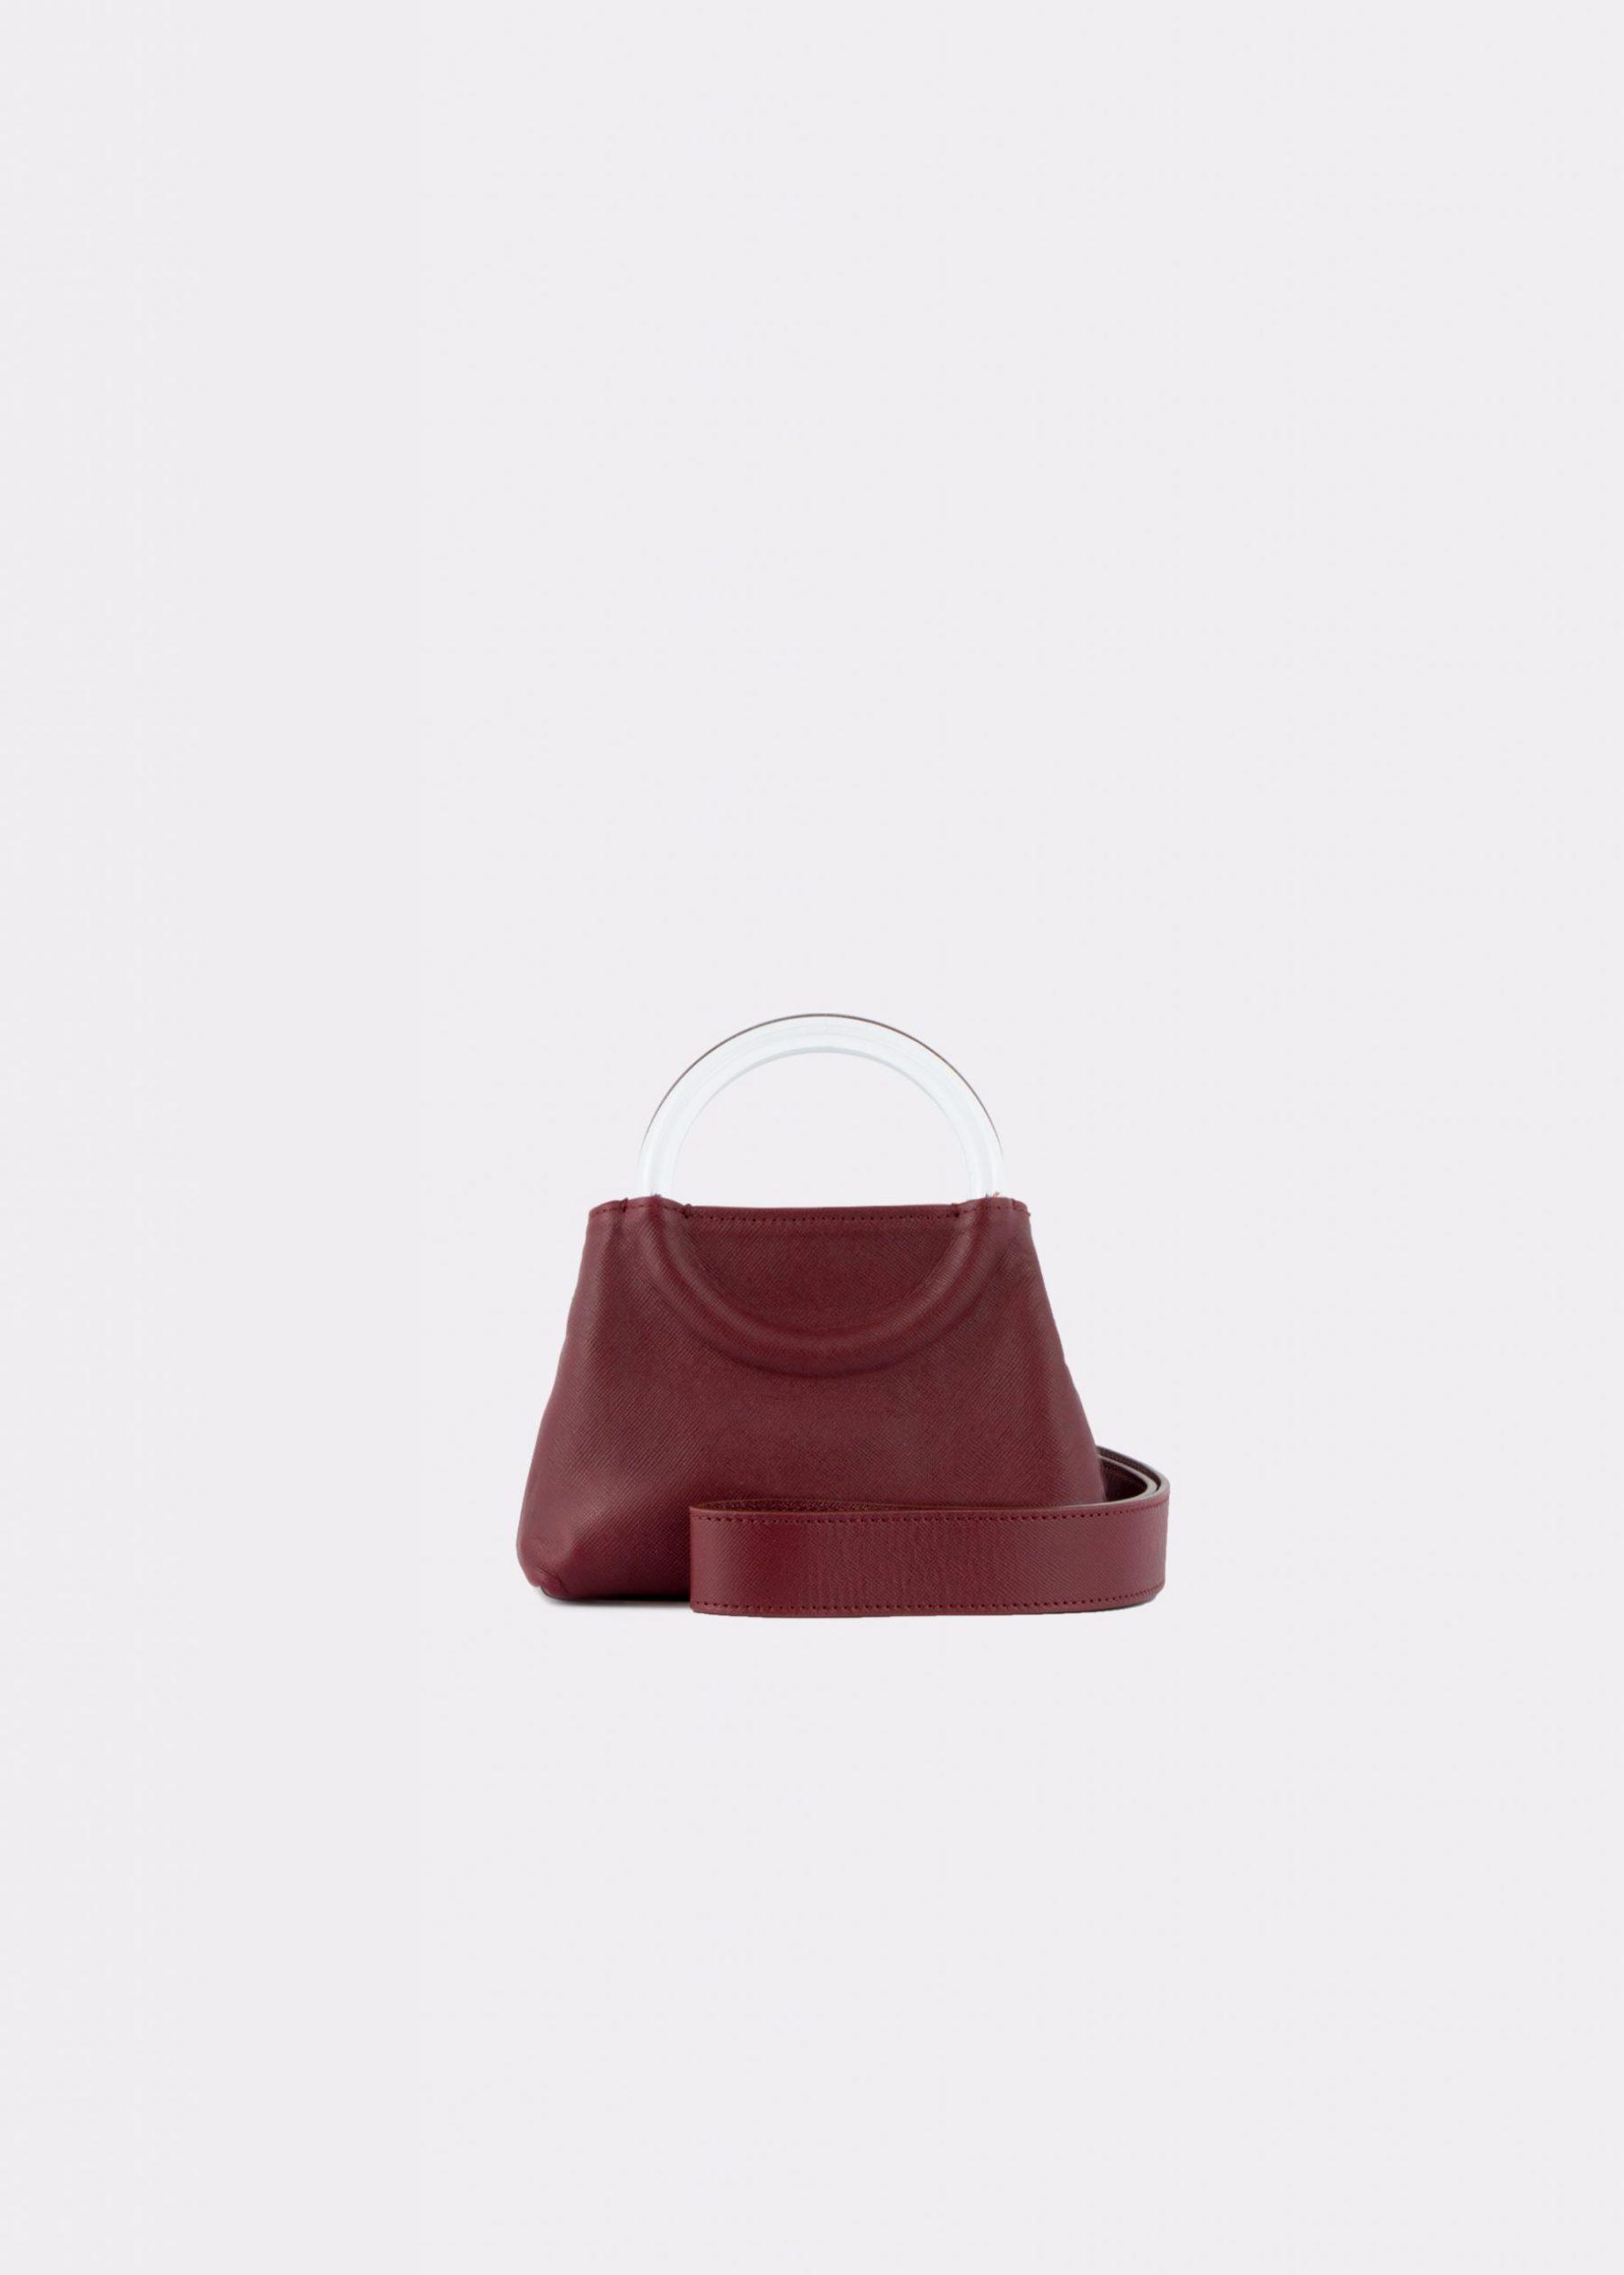 NIDO-Bolla_Micro-bag-bordeaux_shoulder strap view